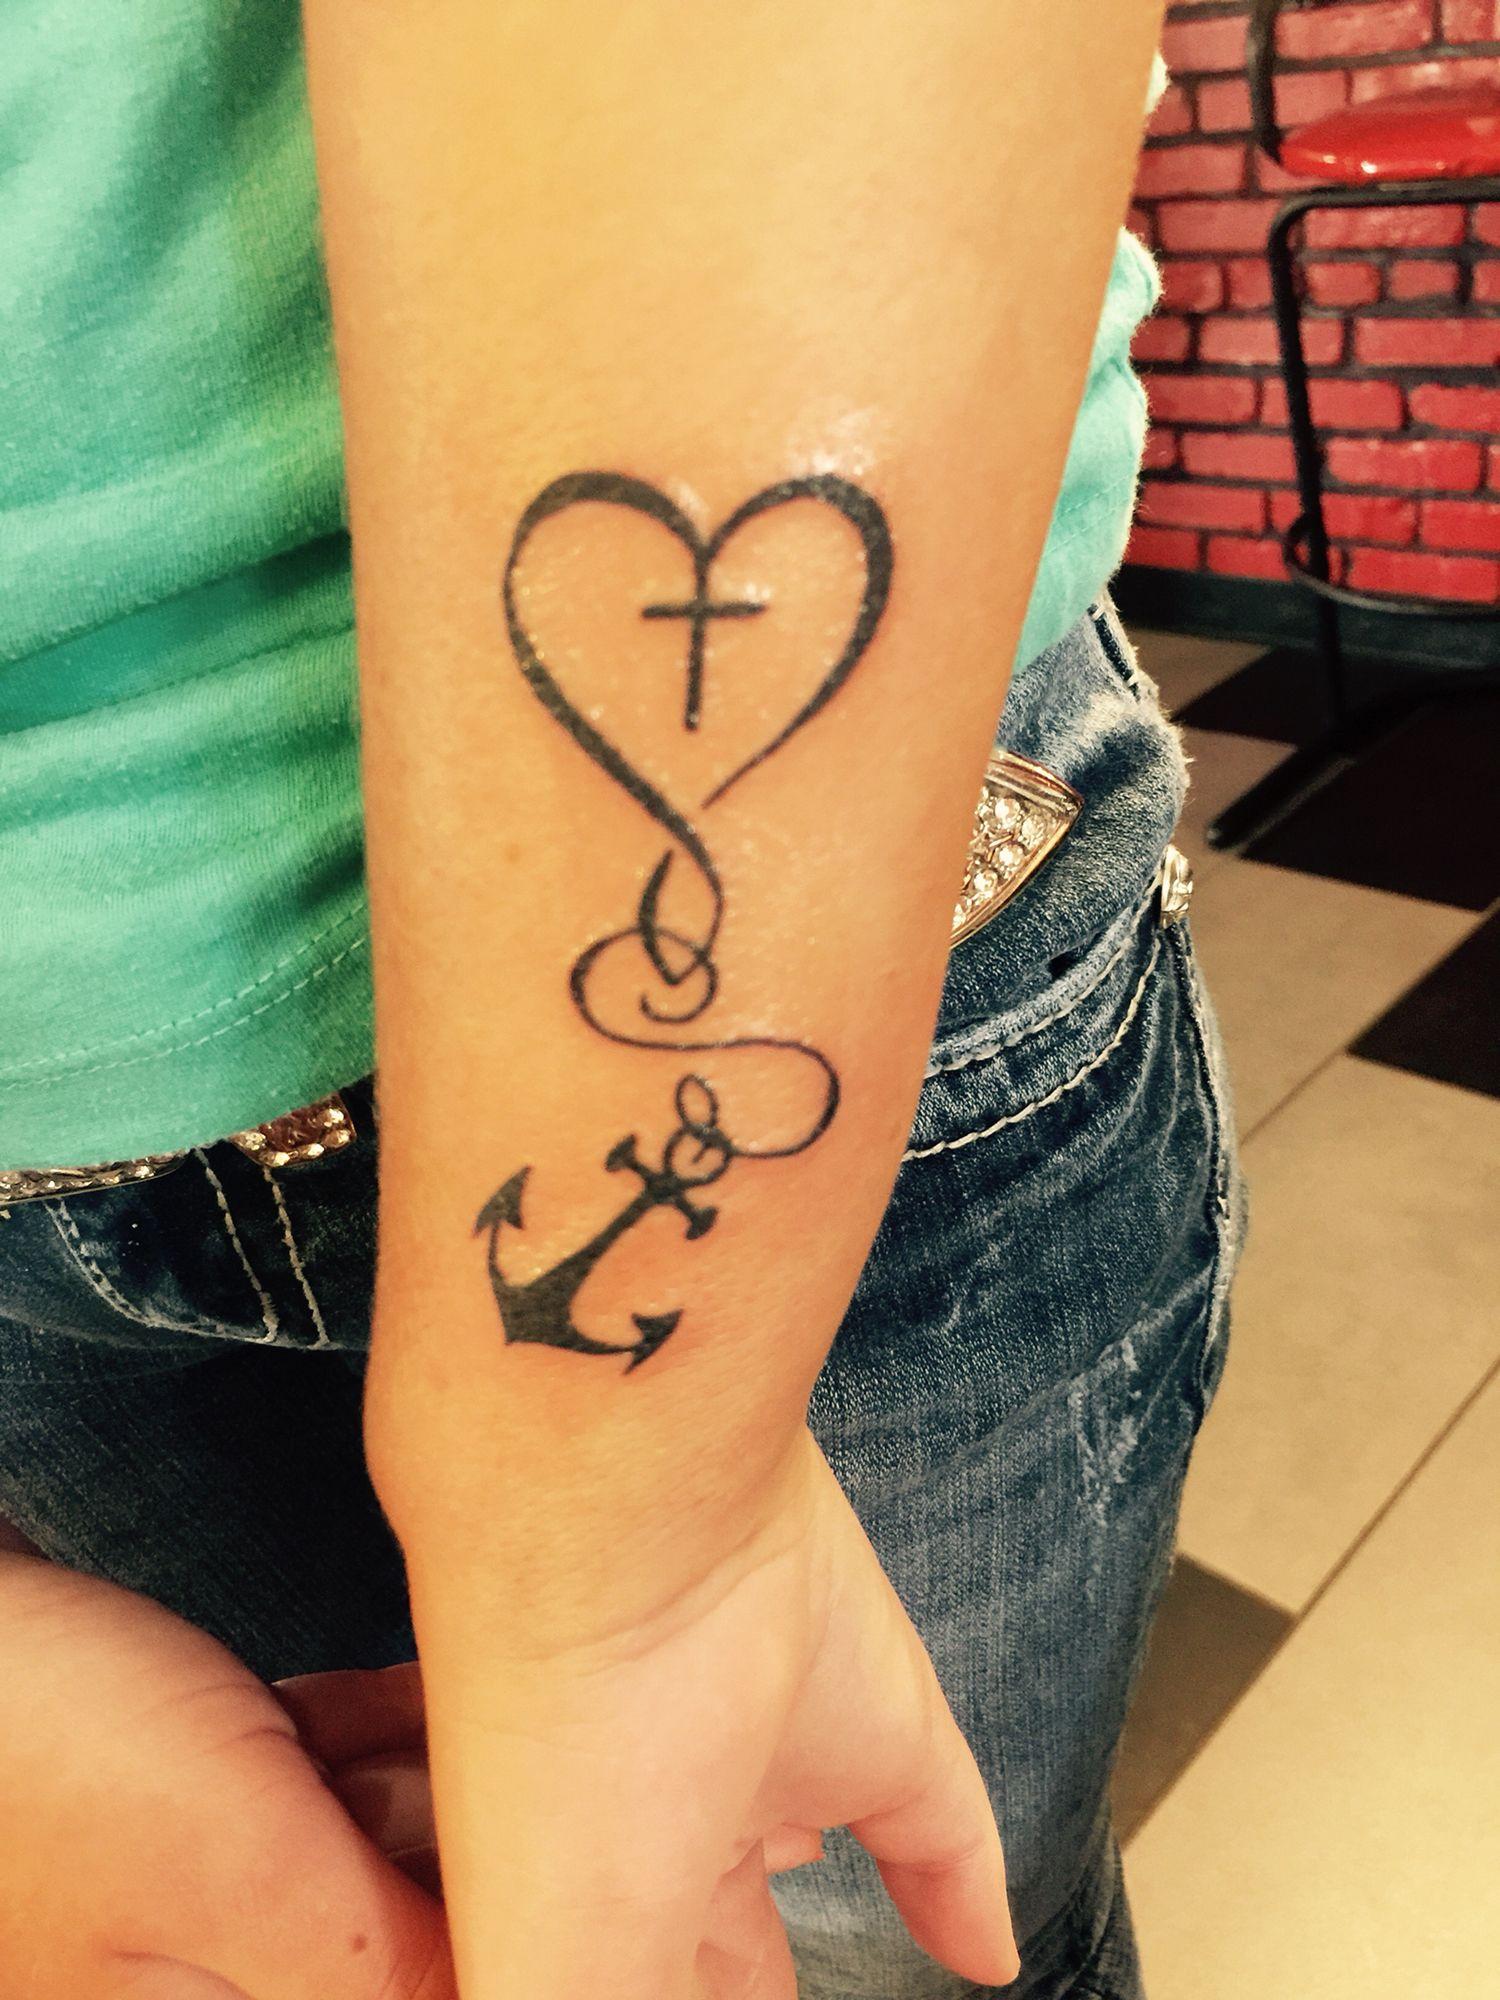 Amazing. Love it | Tatuajes laterales, Tatuajes femeninos, Tatuajes